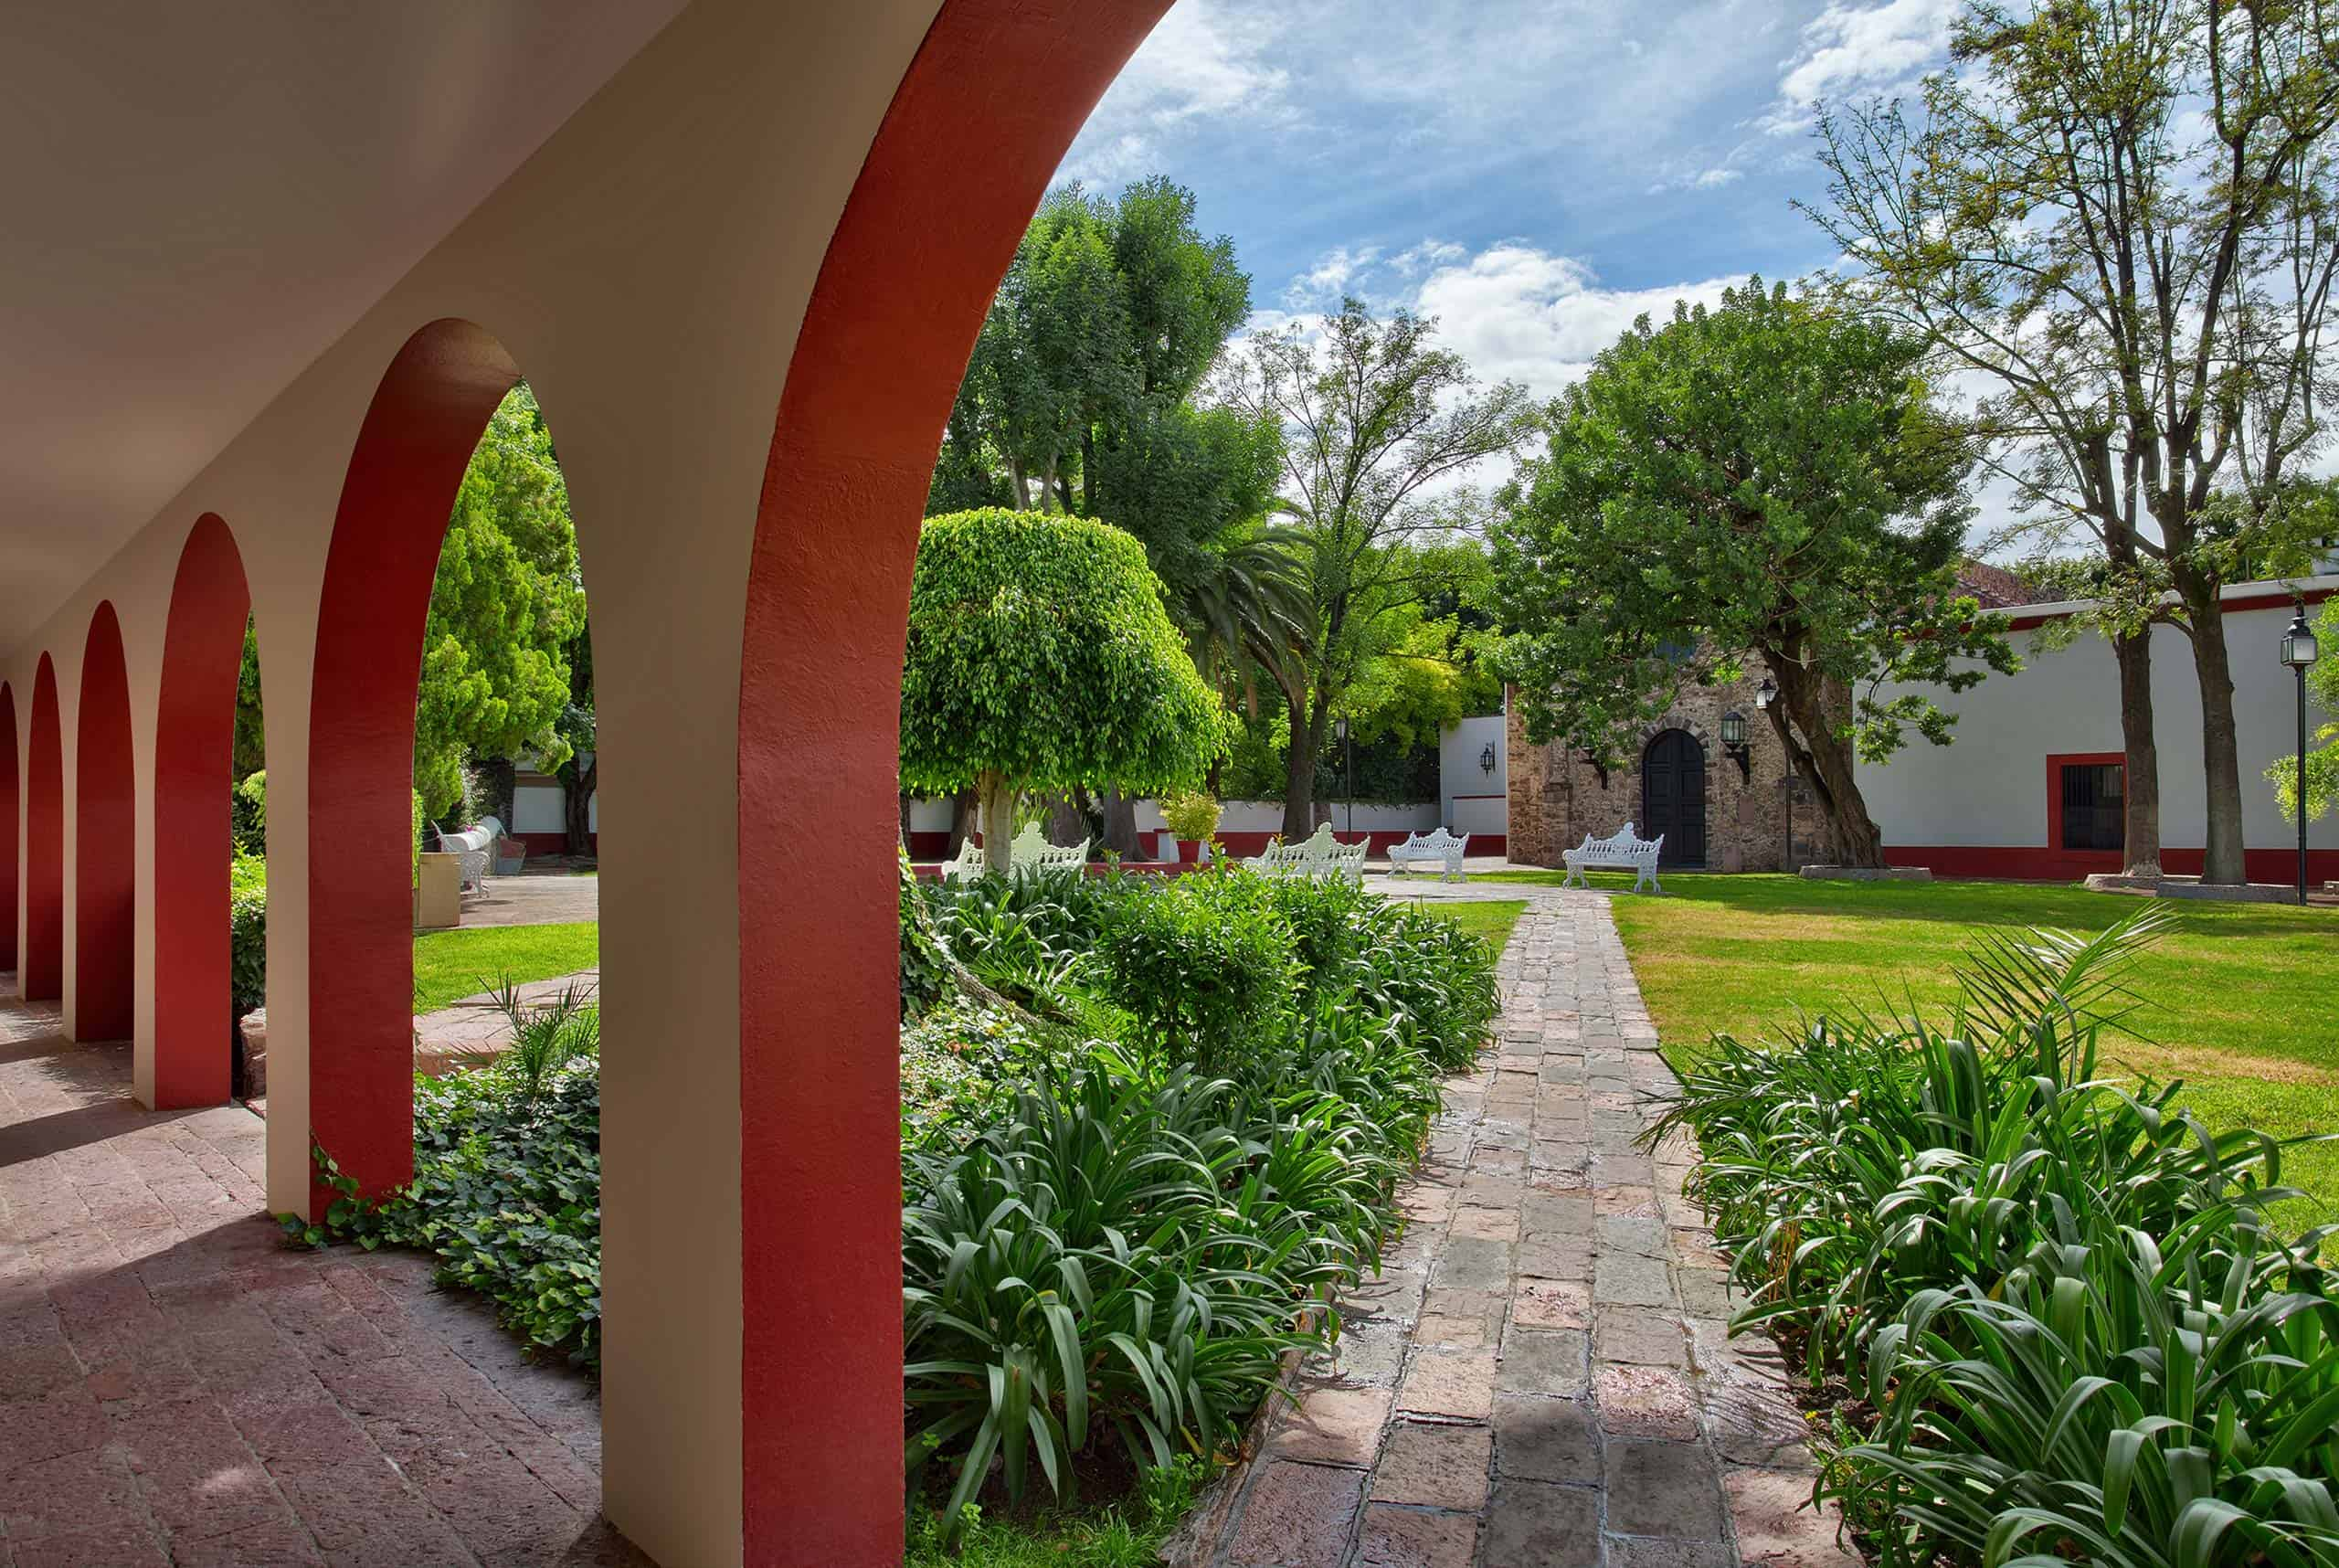 Jardin-Misiones-path